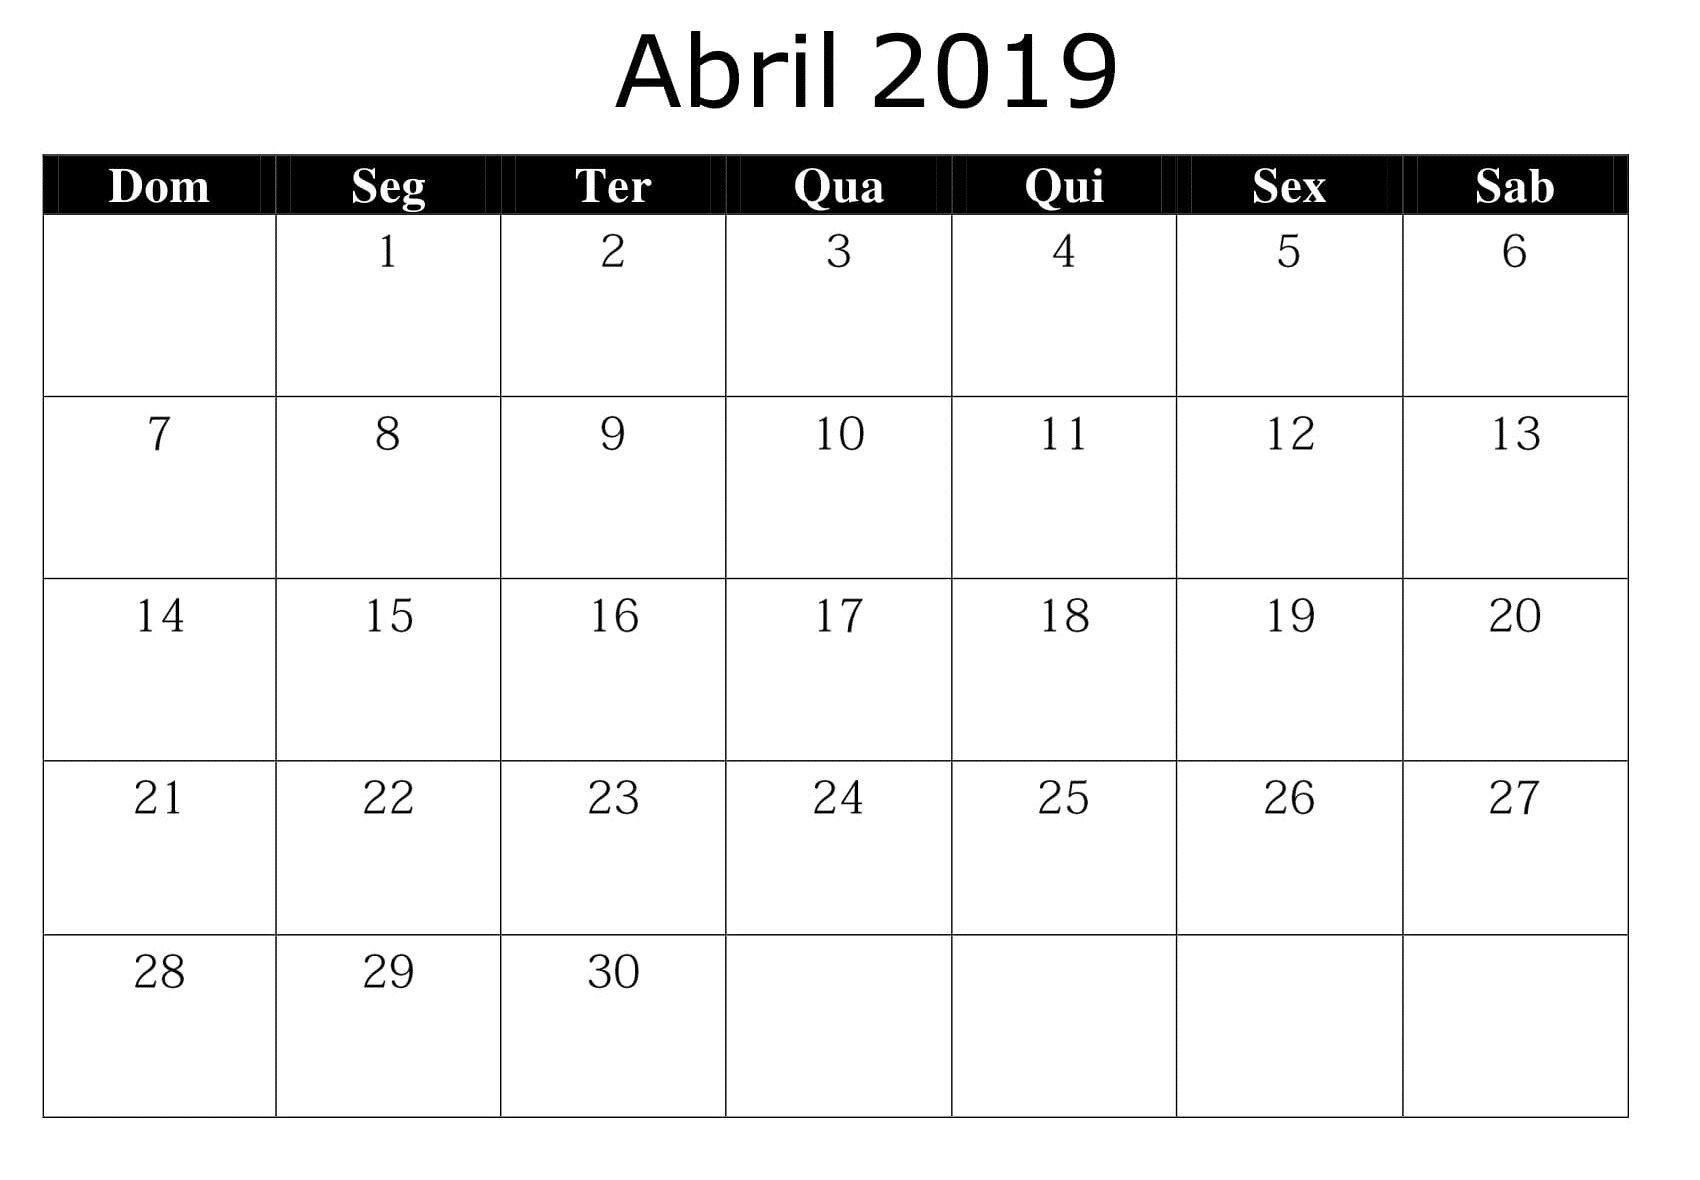 Calendario Enero 2019 Para Imprimir A4 Recientes Calendário Abril 2019 Imprimir Of Calendario Enero 2019 Para Imprimir A4 Más Arriba-a-fecha Calendario Abril 2019 Para Imprimir T